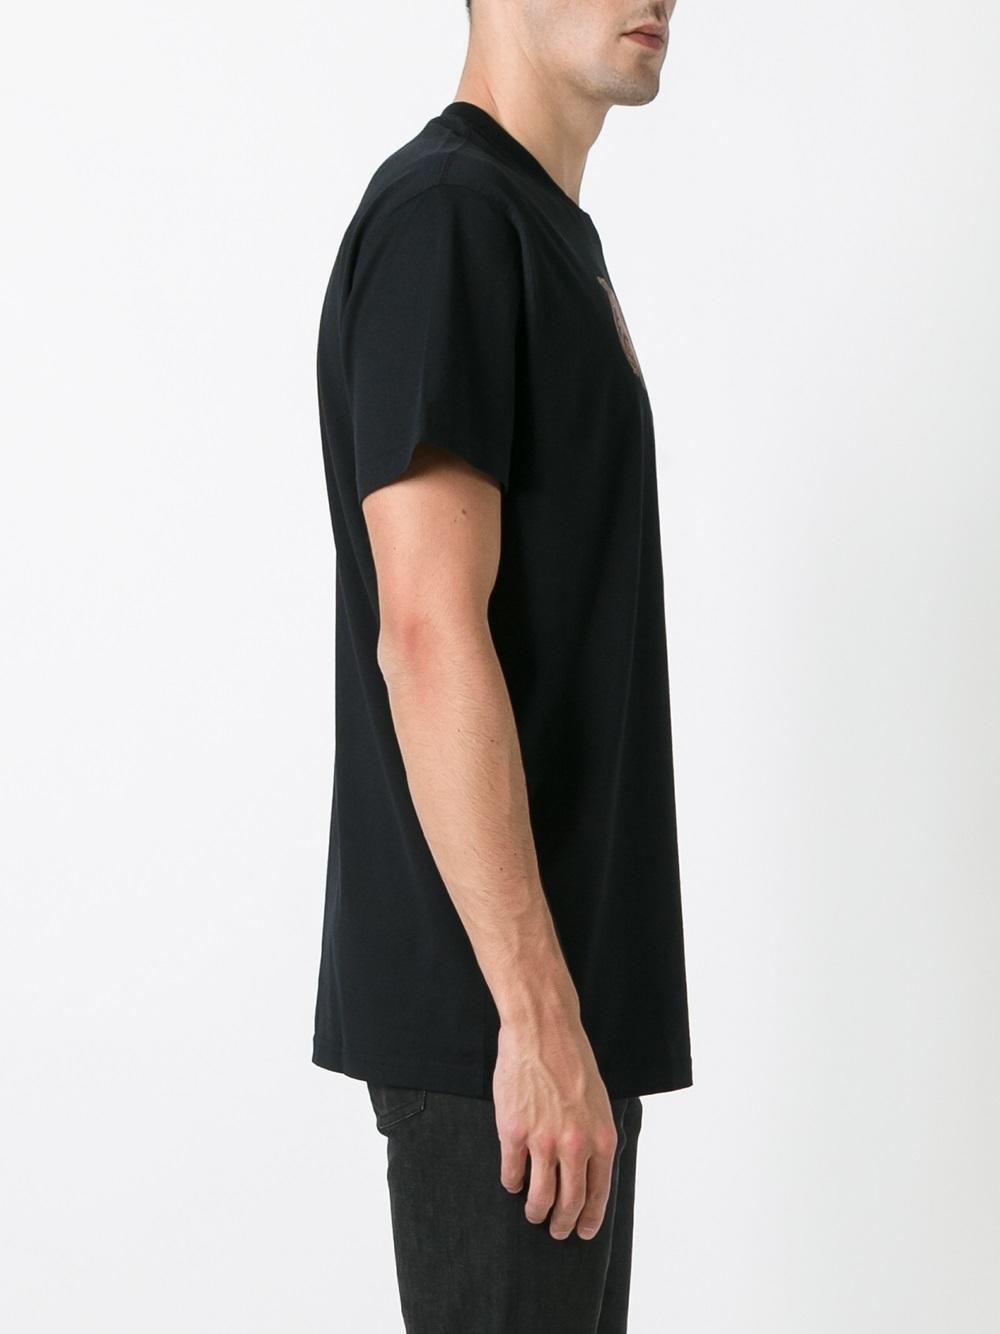 givenchy cuban fit 17 print t shirt in black for men lyst. Black Bedroom Furniture Sets. Home Design Ideas